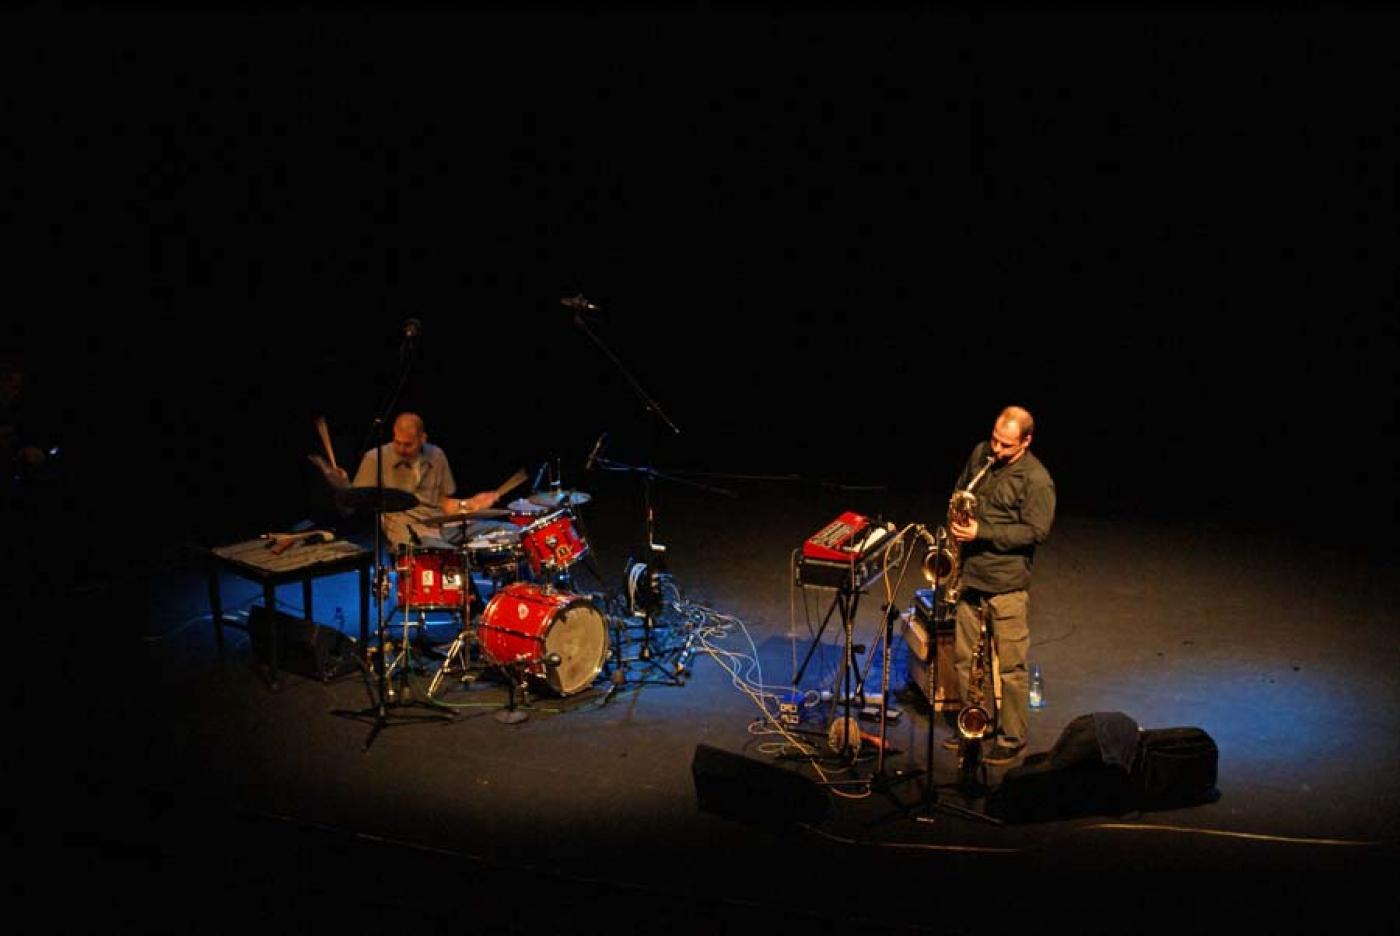 Tomasz Glazik & Jacek Buhl, fragment koncertu, 2007